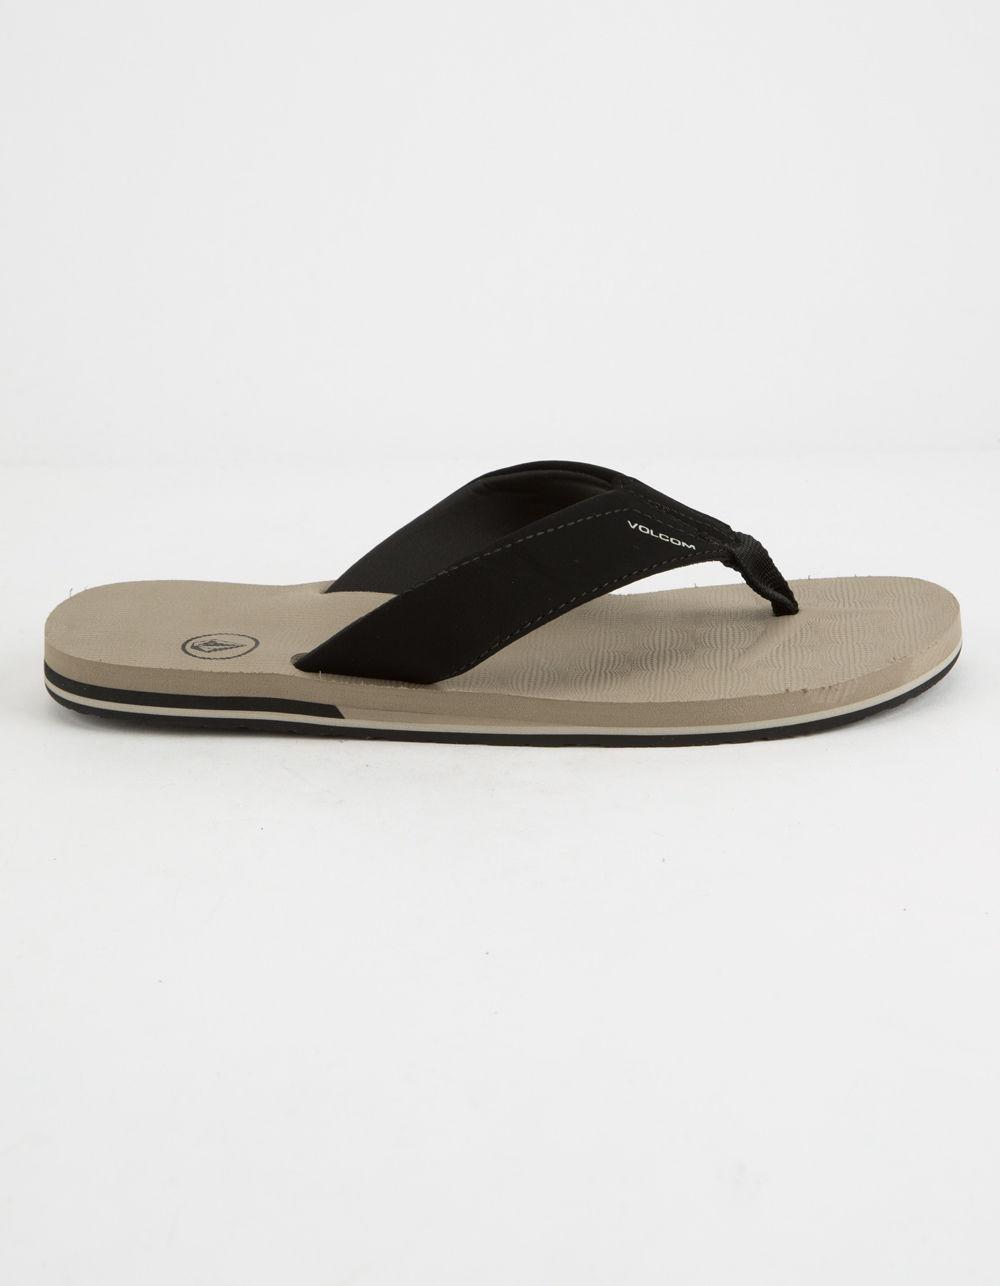 09363d645de9d Lyst - Volcom Victor Mens Sandals in Black for Men